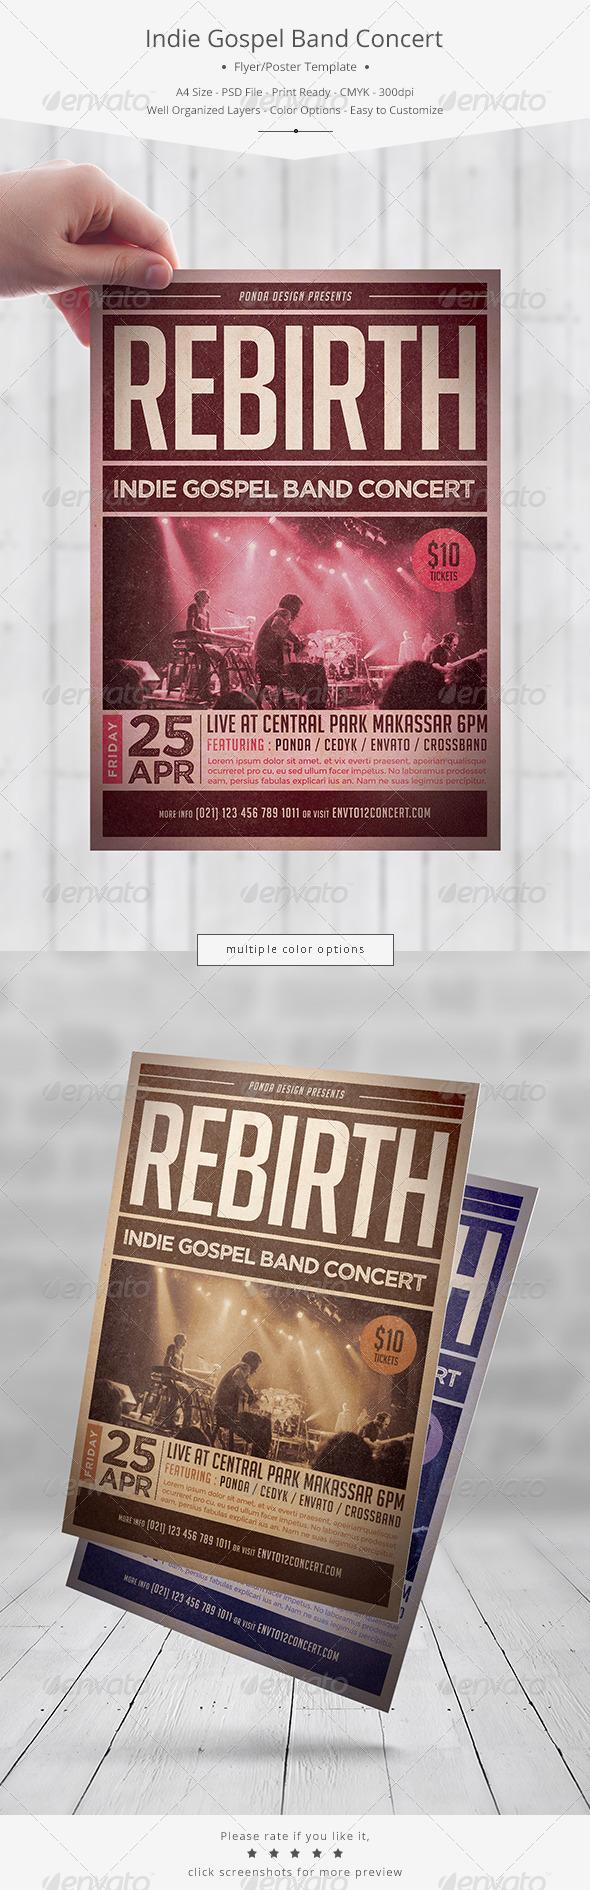 GraphicRiver Indie Gospel Band Concert Flyer 7345481